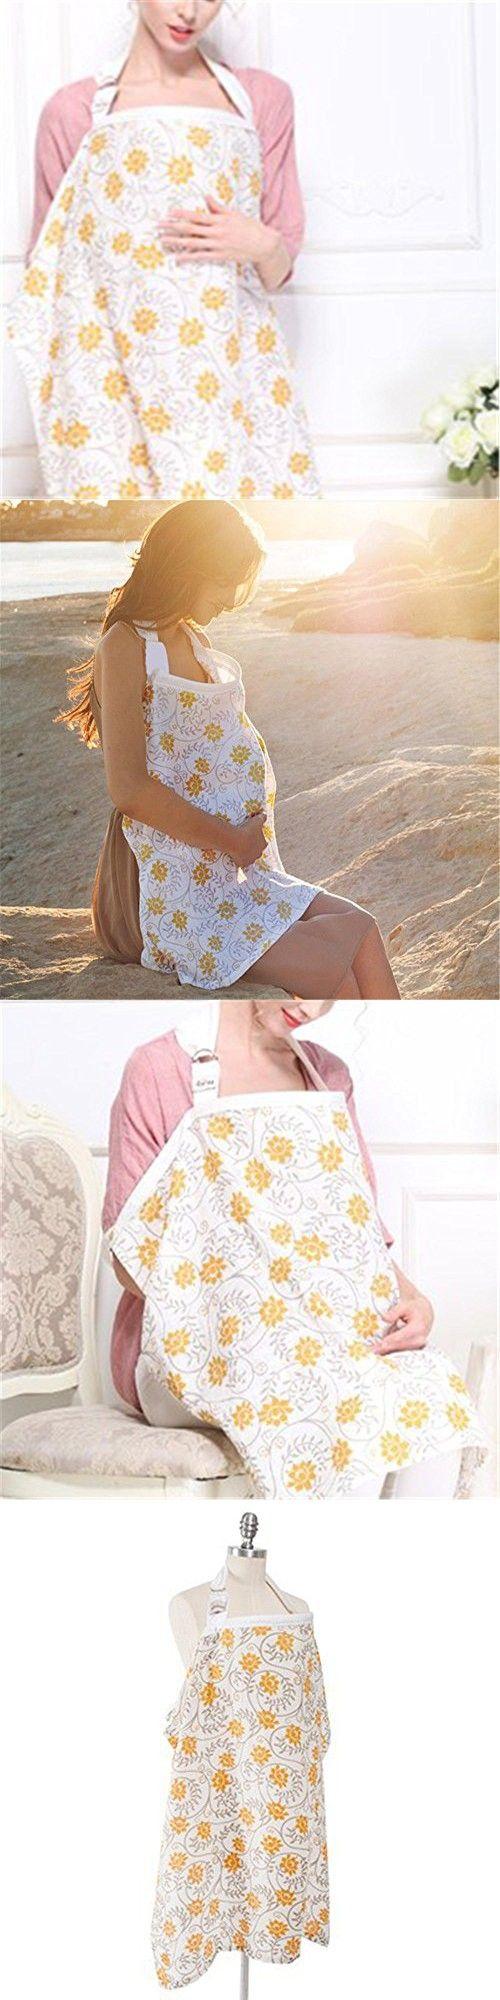 Anbaby Privacy Nursing Cover Baby Mum Breastfeeding Nursing Poncho Cover Up Udder Covers Cotton Blanket Shawl (B)